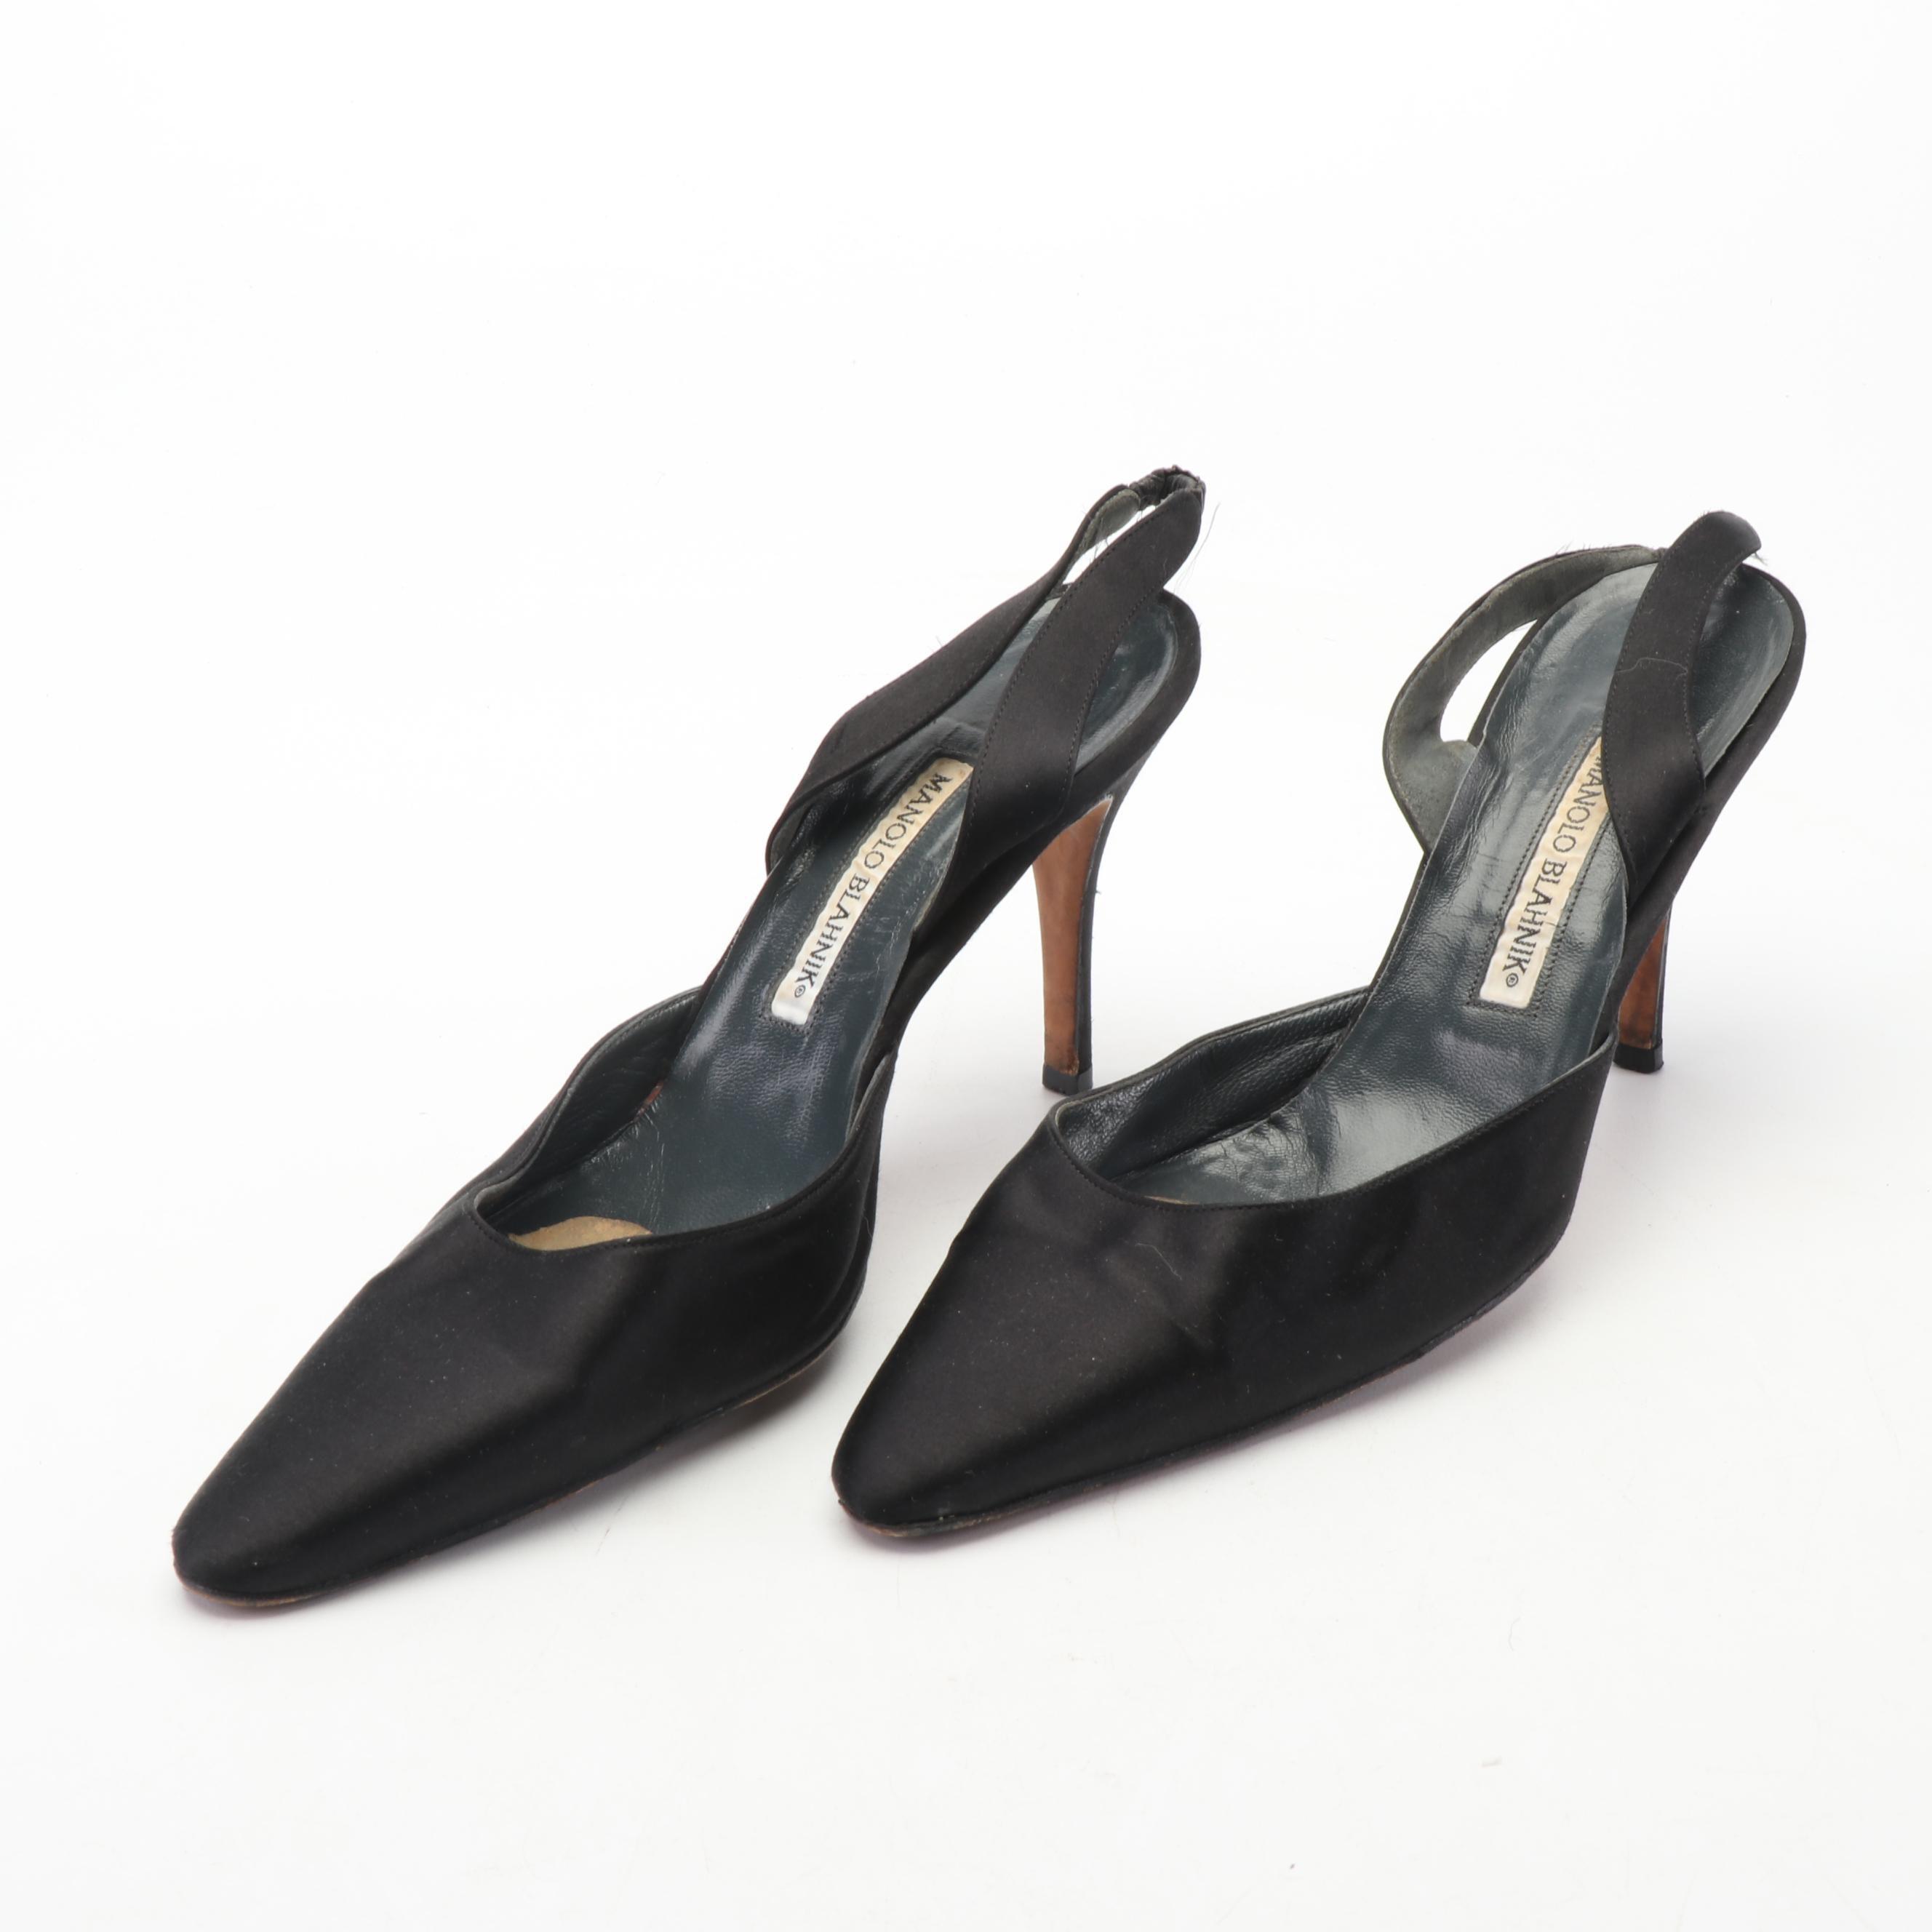 Manolo Blahnik Black Satin Slingback Heels